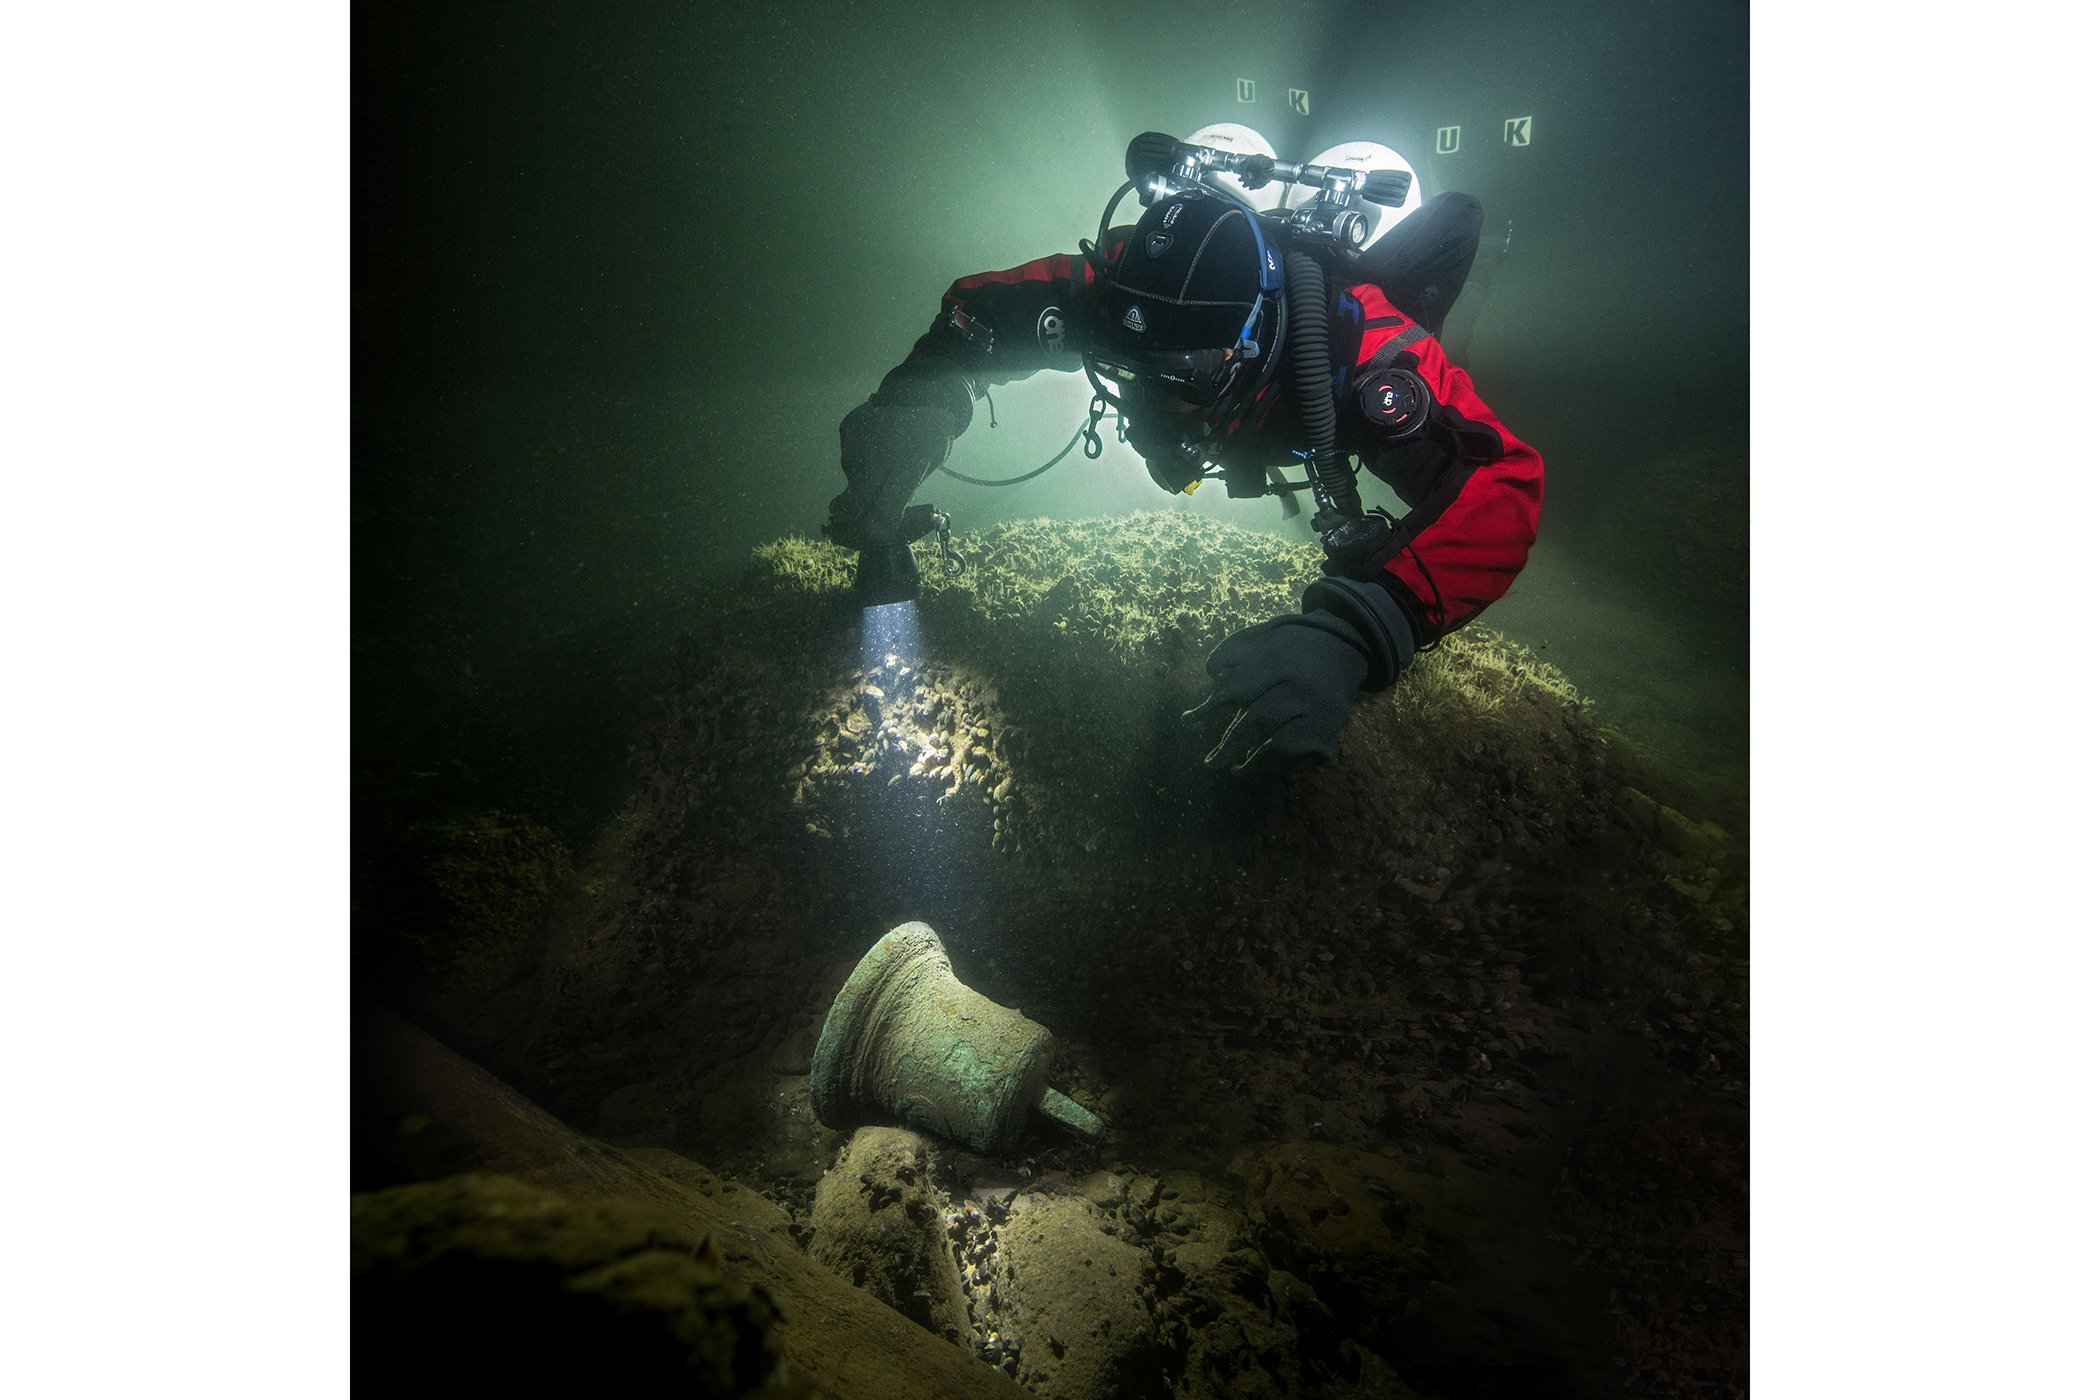 UnderwaterPhotographerOfTheYear_303PekkaTuuri.jpg